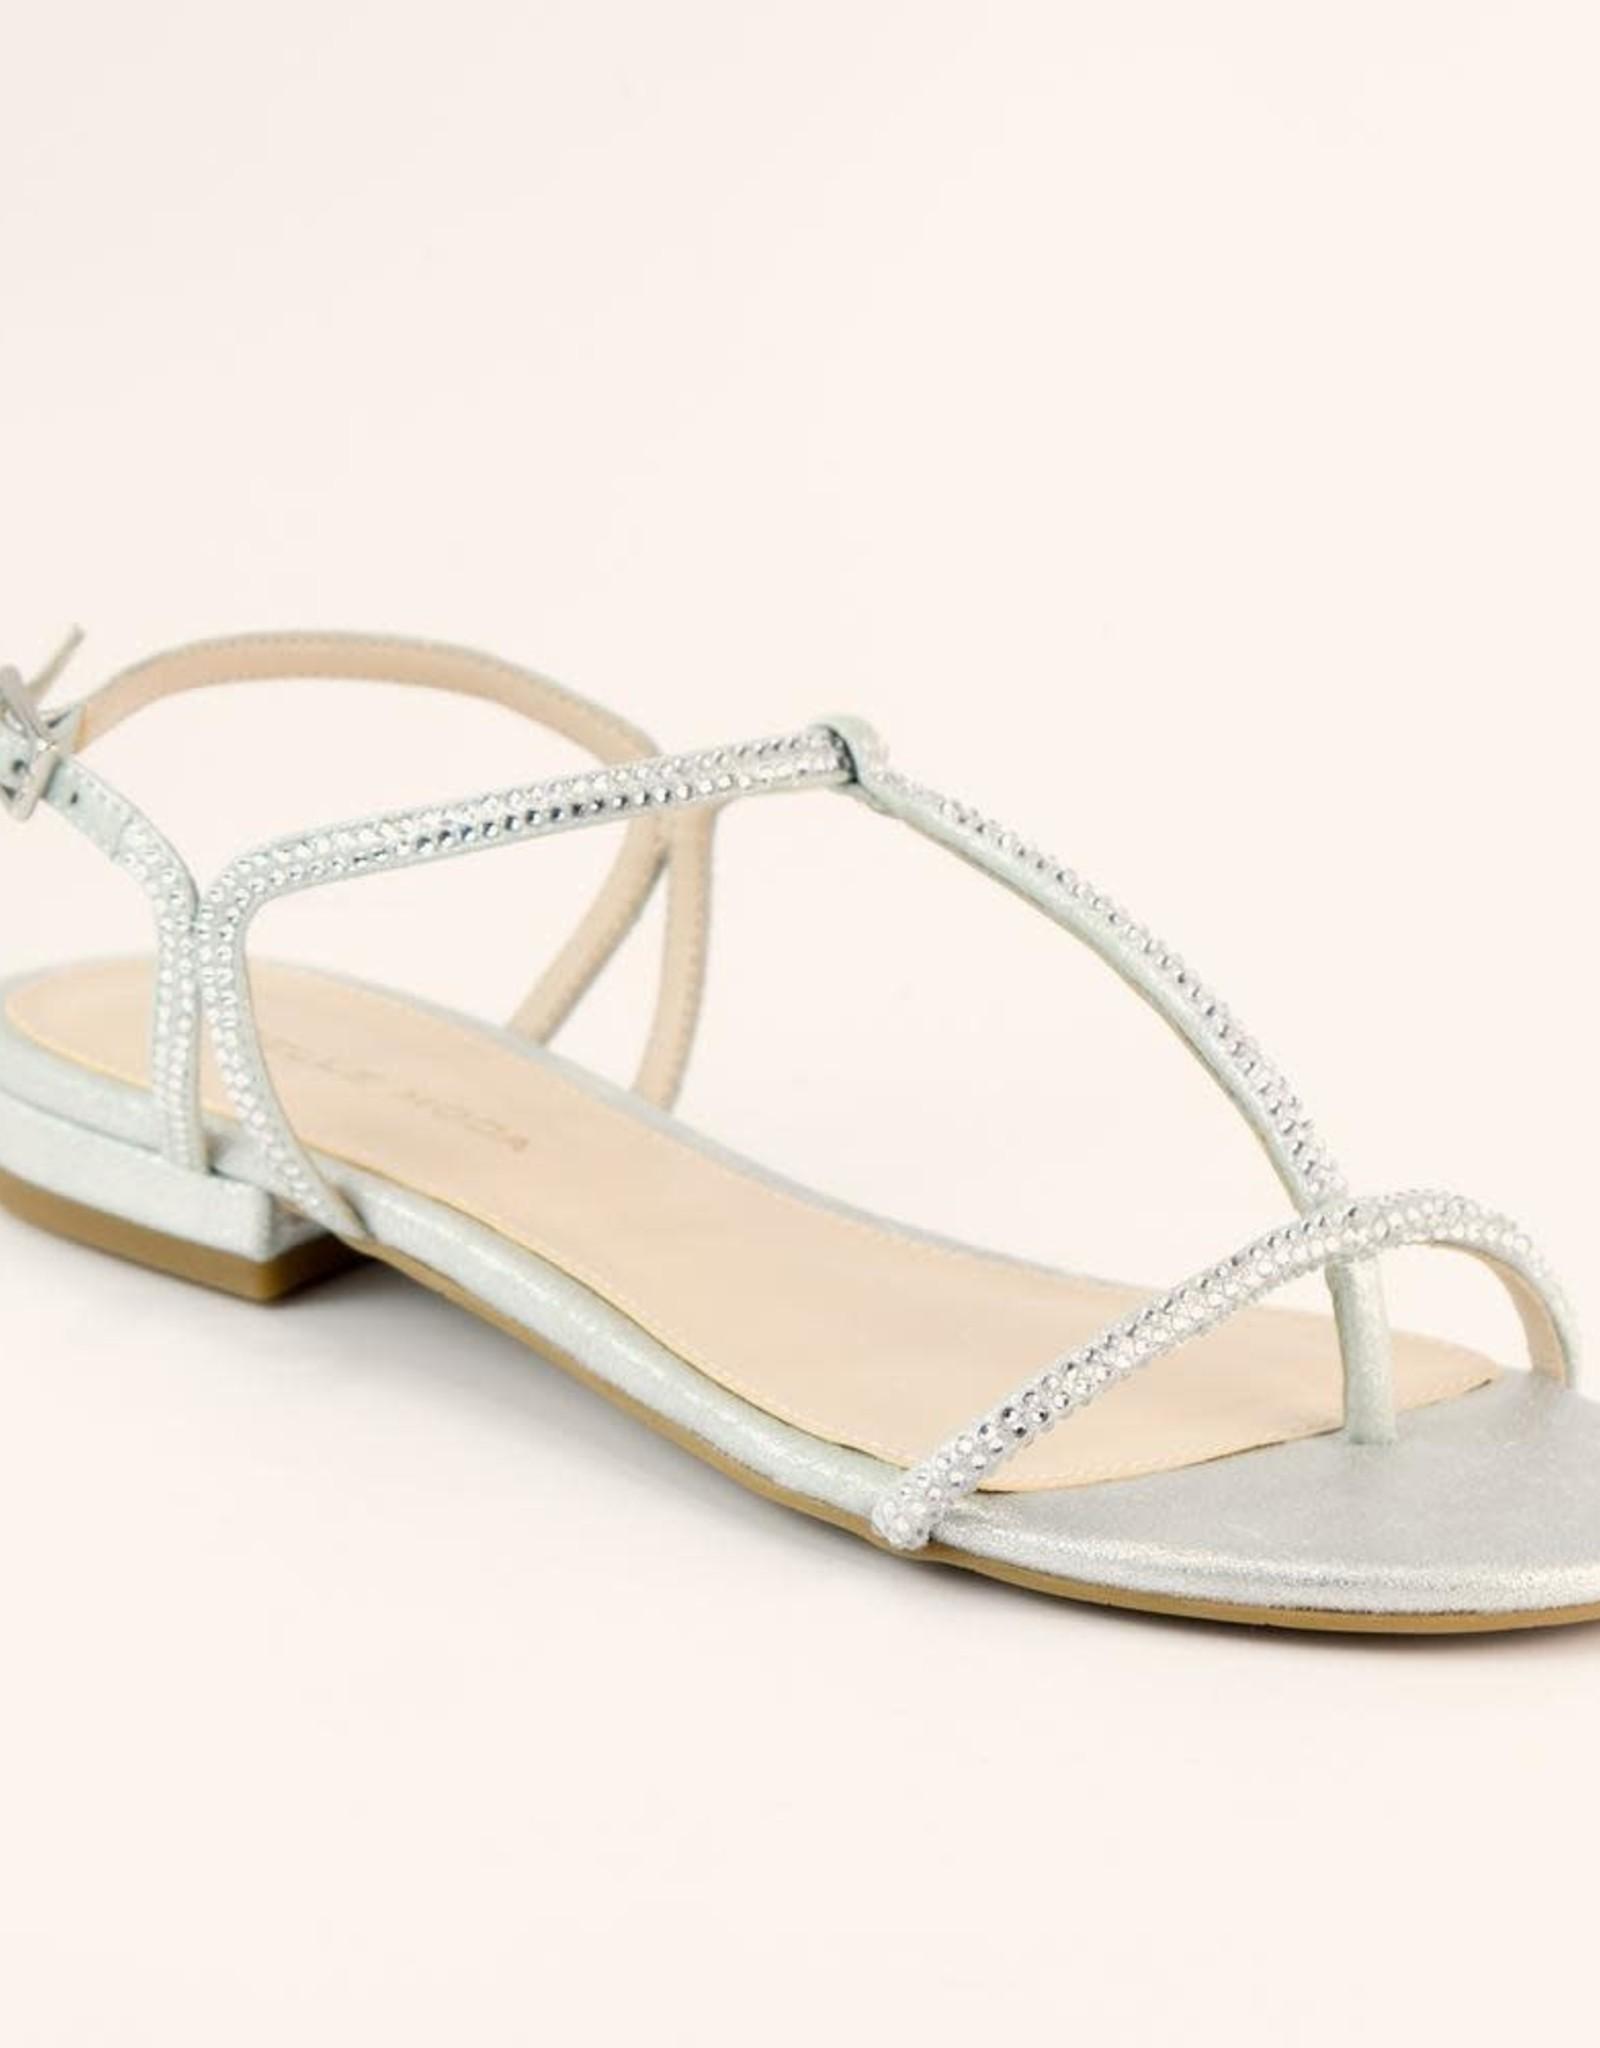 PELLE MODA Barber Metallic Suede Sandal